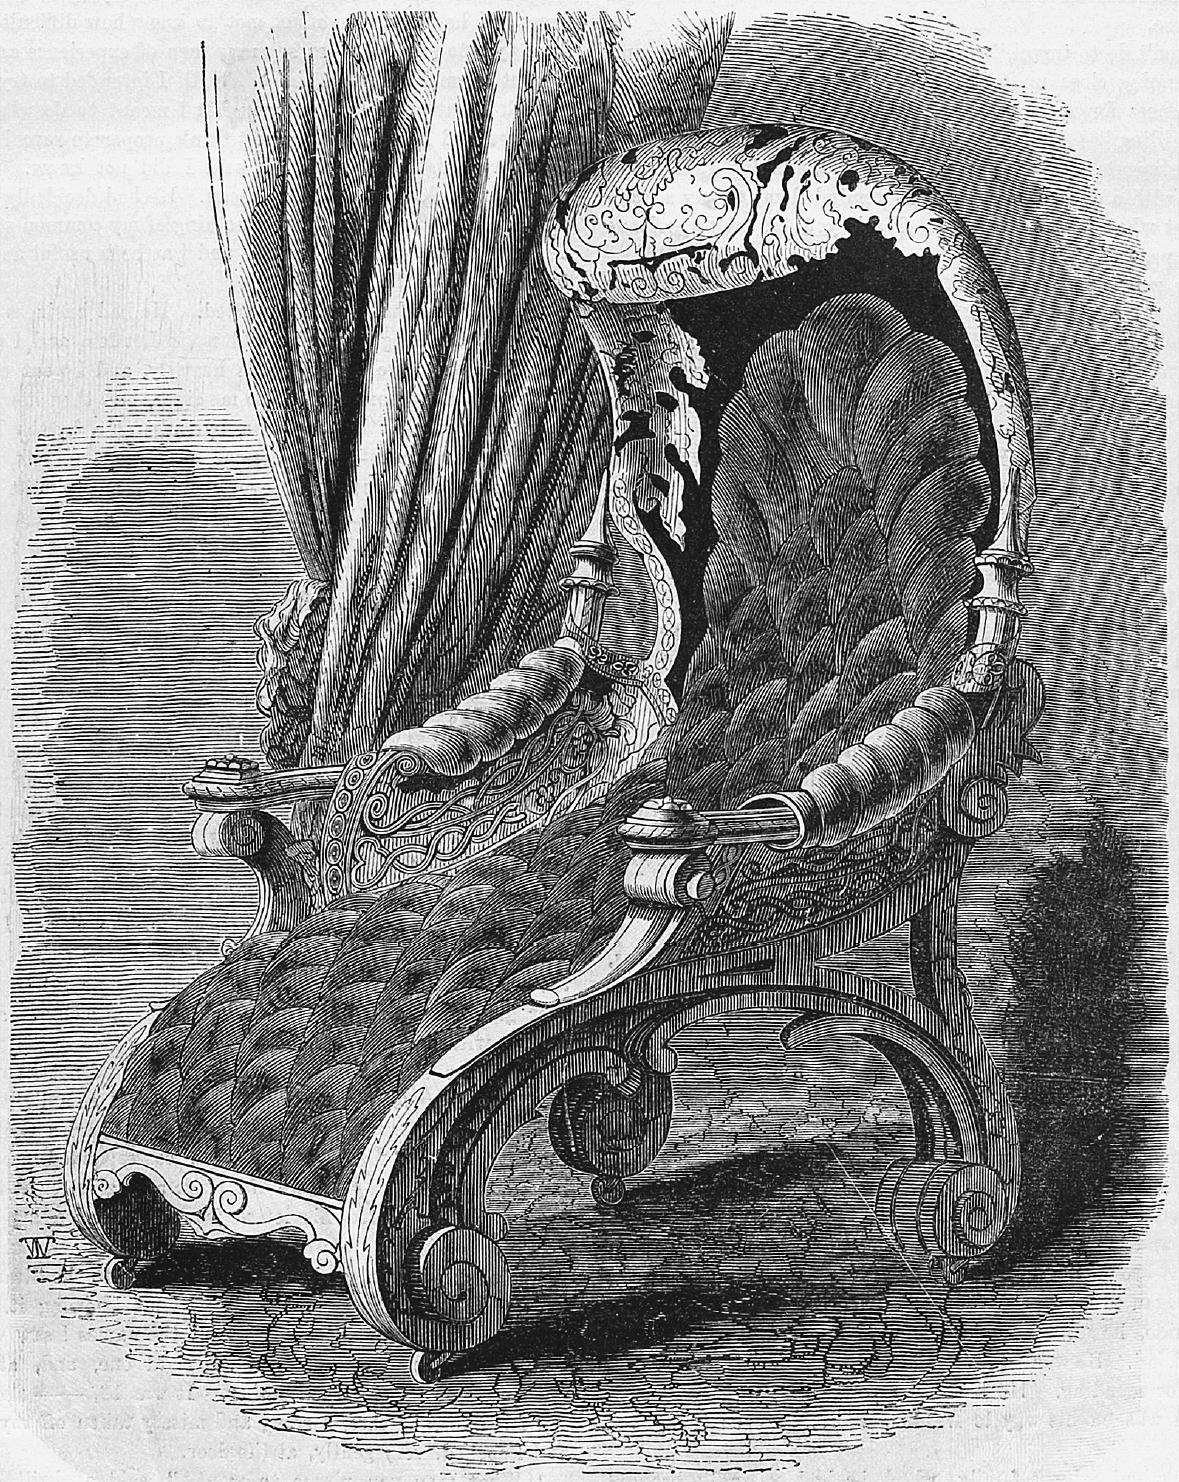 Papier Mache Chair